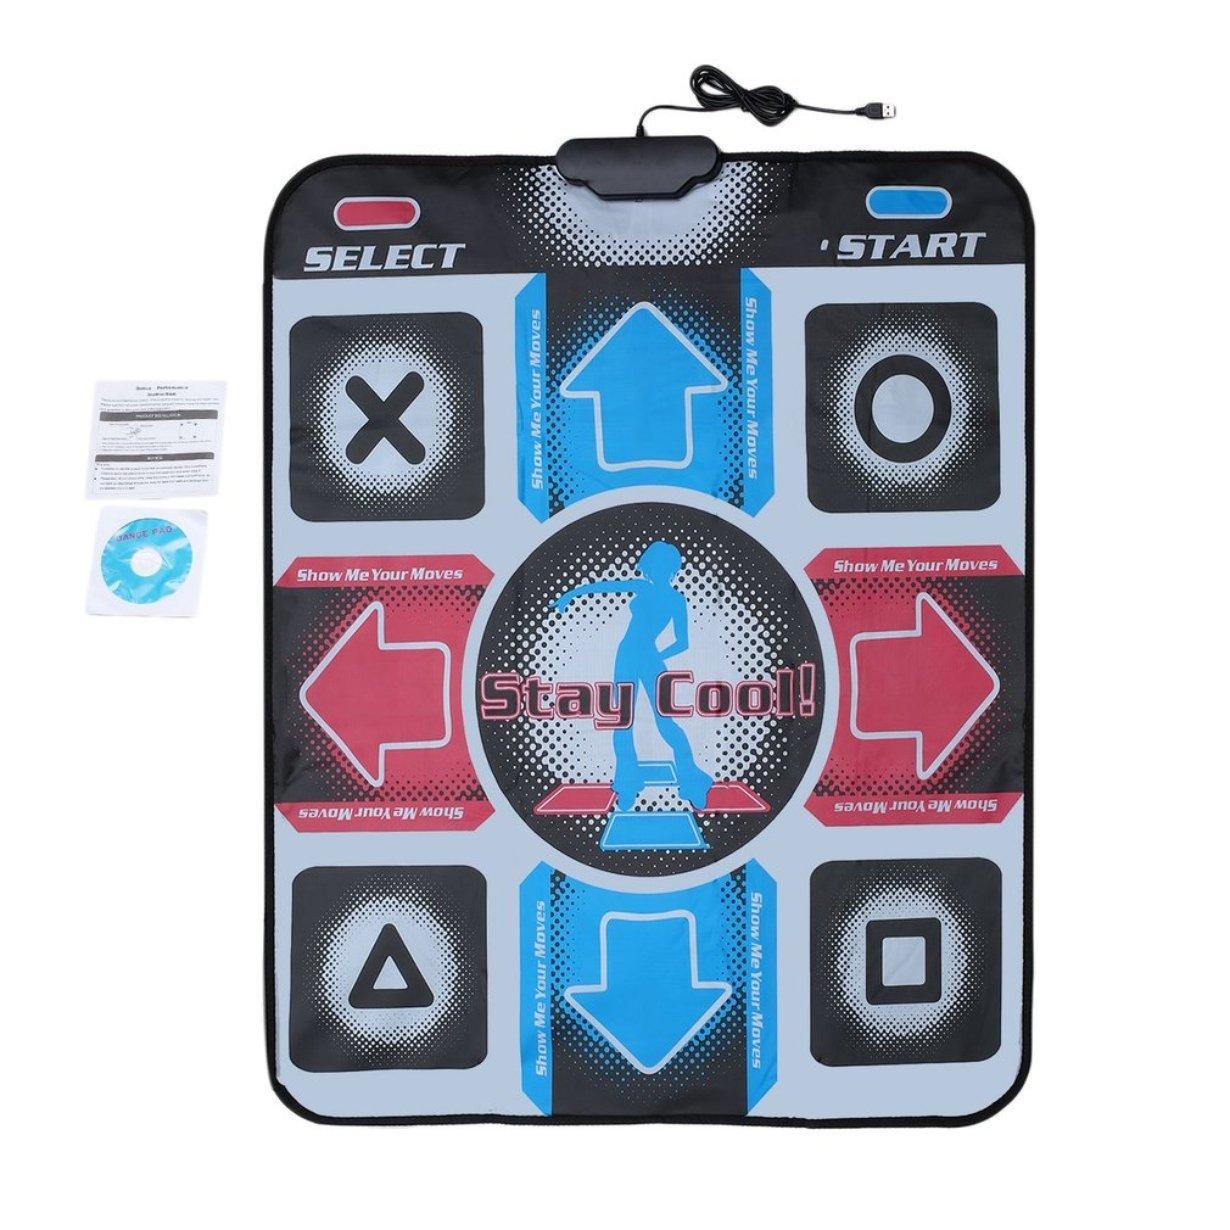 UniqueHeart Antideslizante Durable Resistente al Desgaste Baile Step Dance Pad Pad Pad Dancer Blanket para PC con USB para Culturismo Fitness